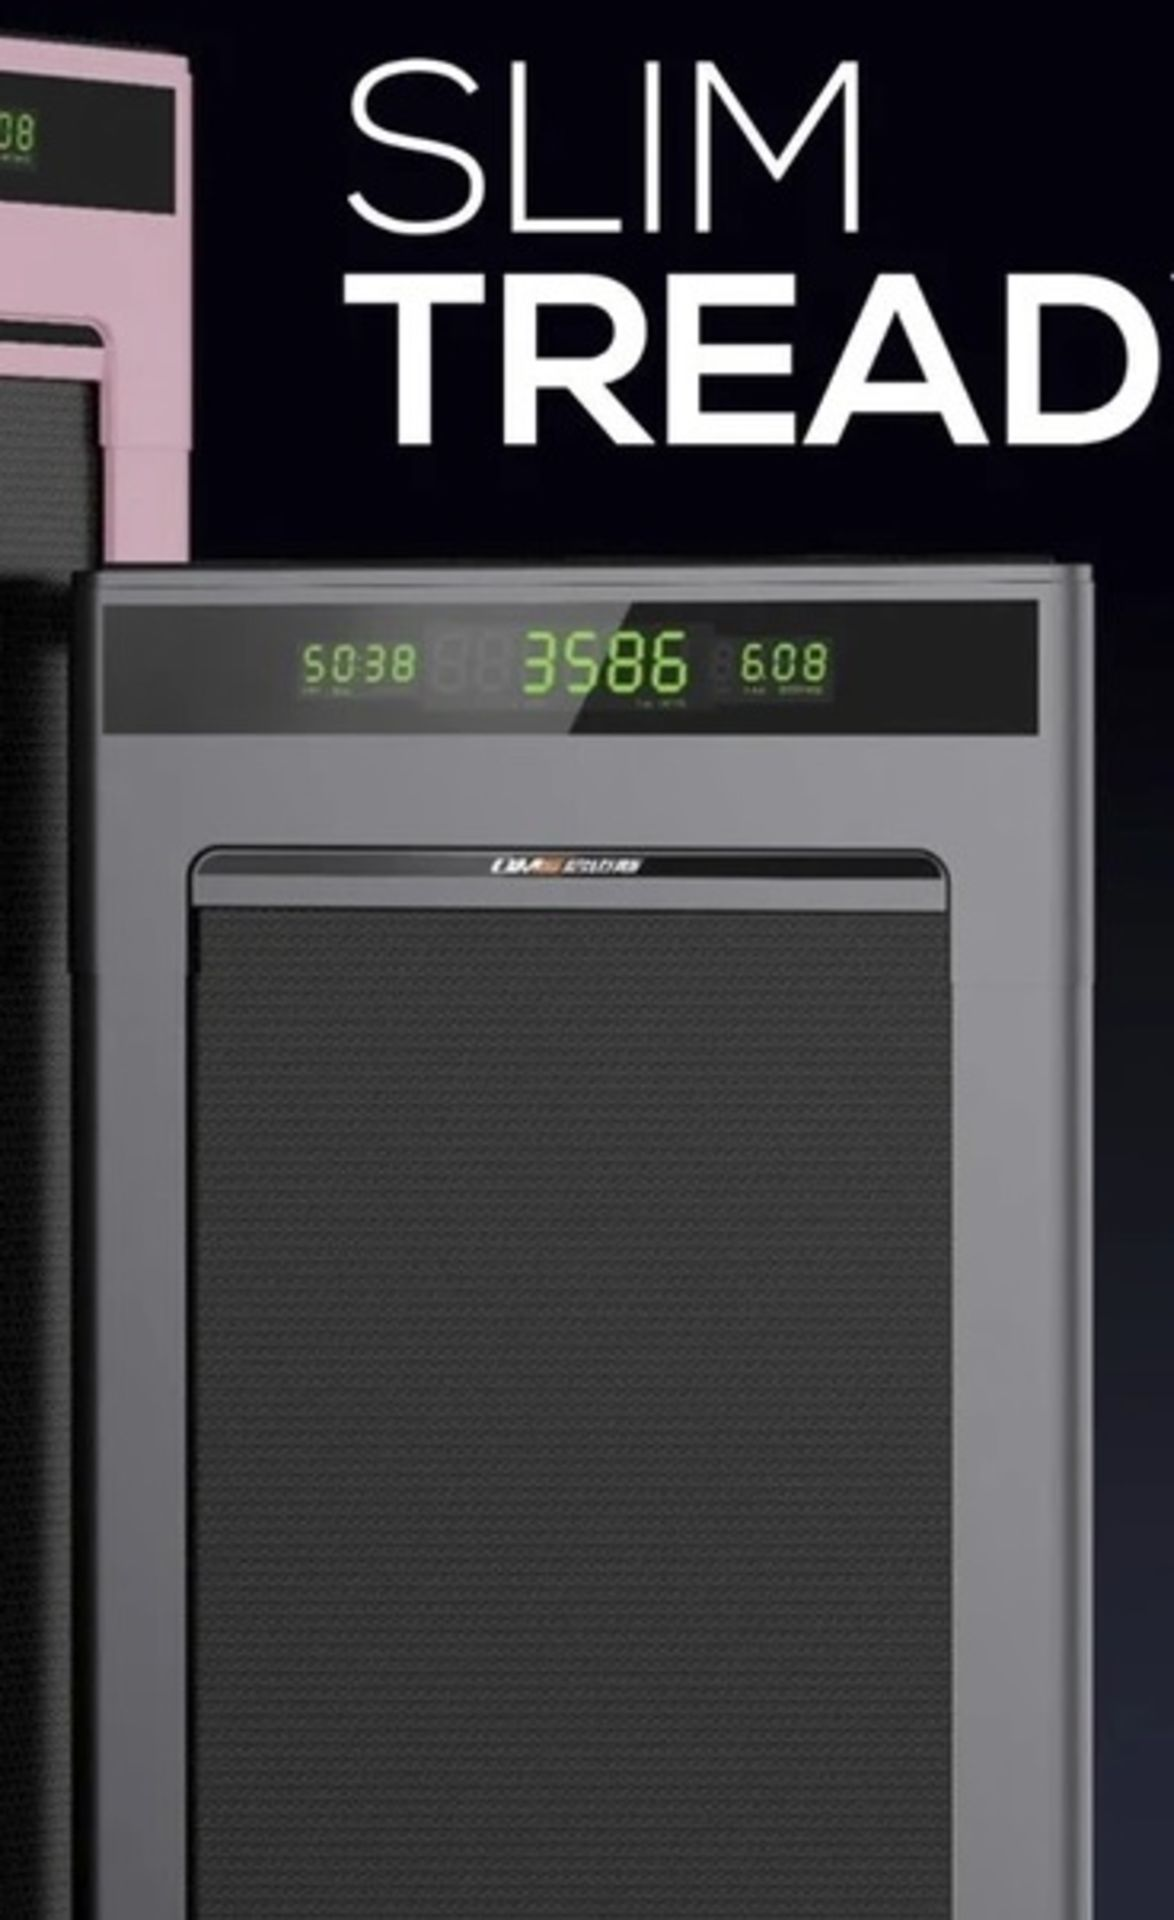 1 x Slim Tread Ultra Thin Smart Treadmill Running / Walking Machine - Lightweight With Folding - Image 22 of 23